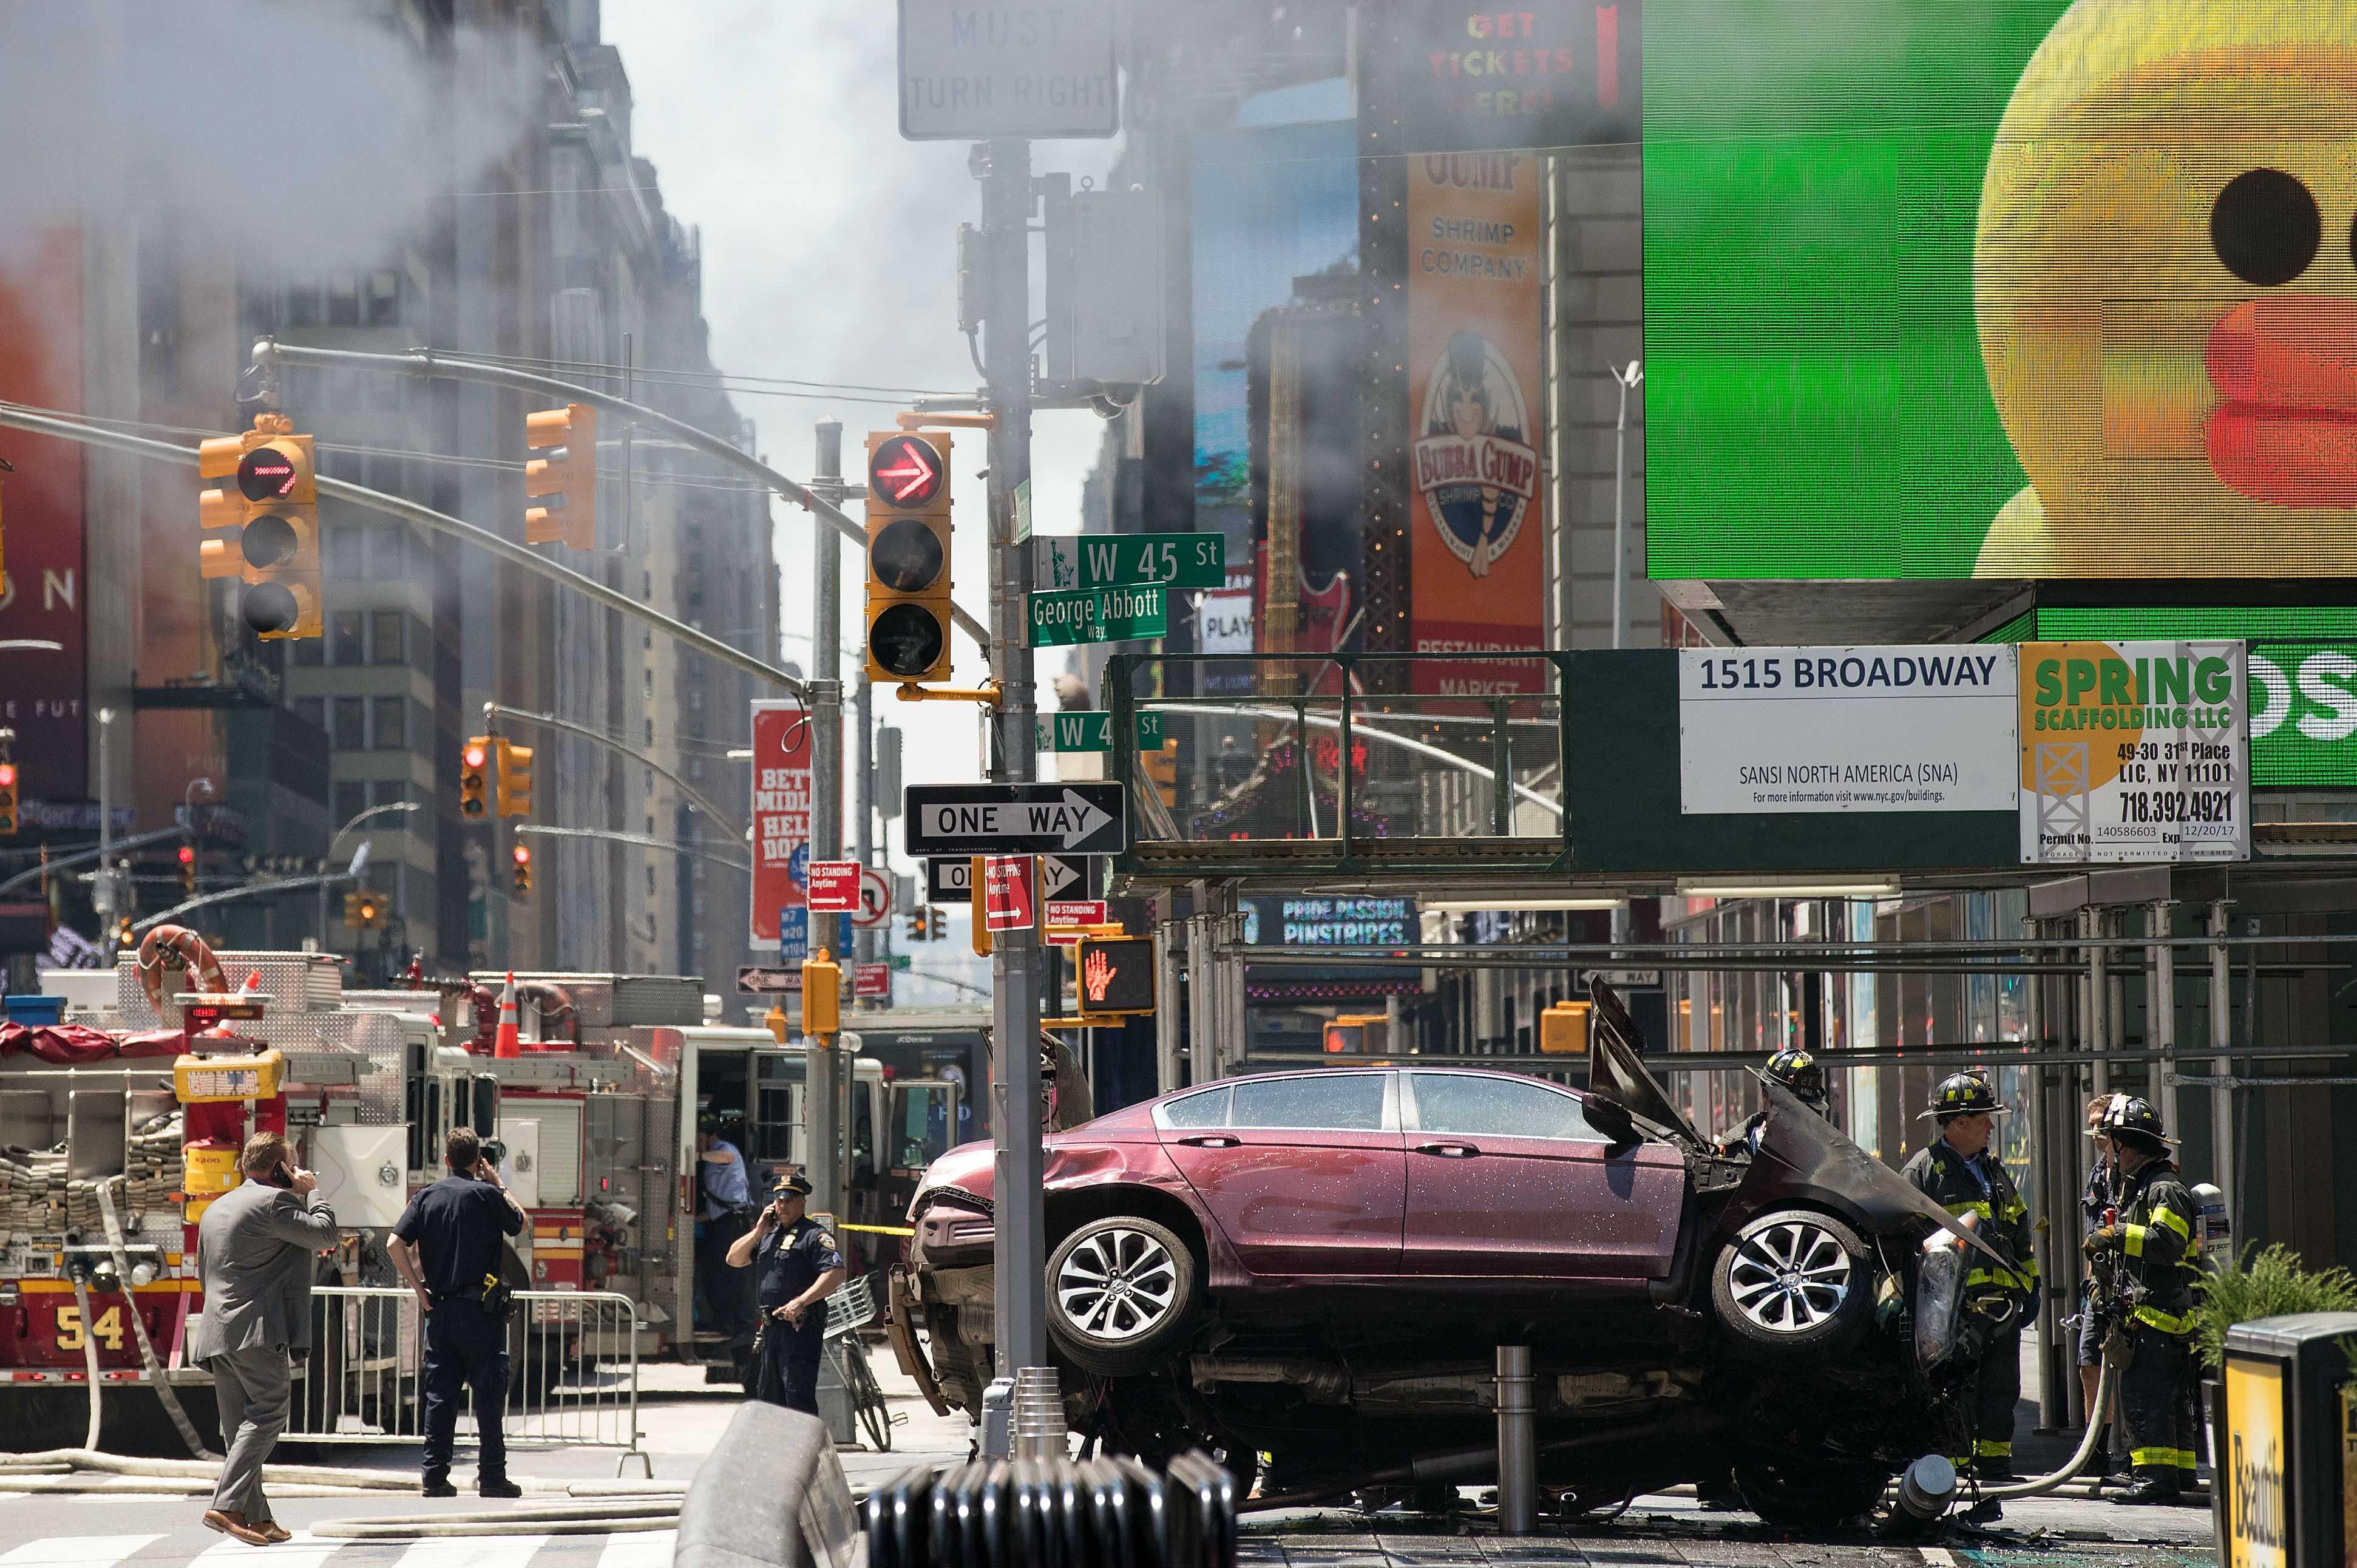 Un carro atropella a multitud en Times Square